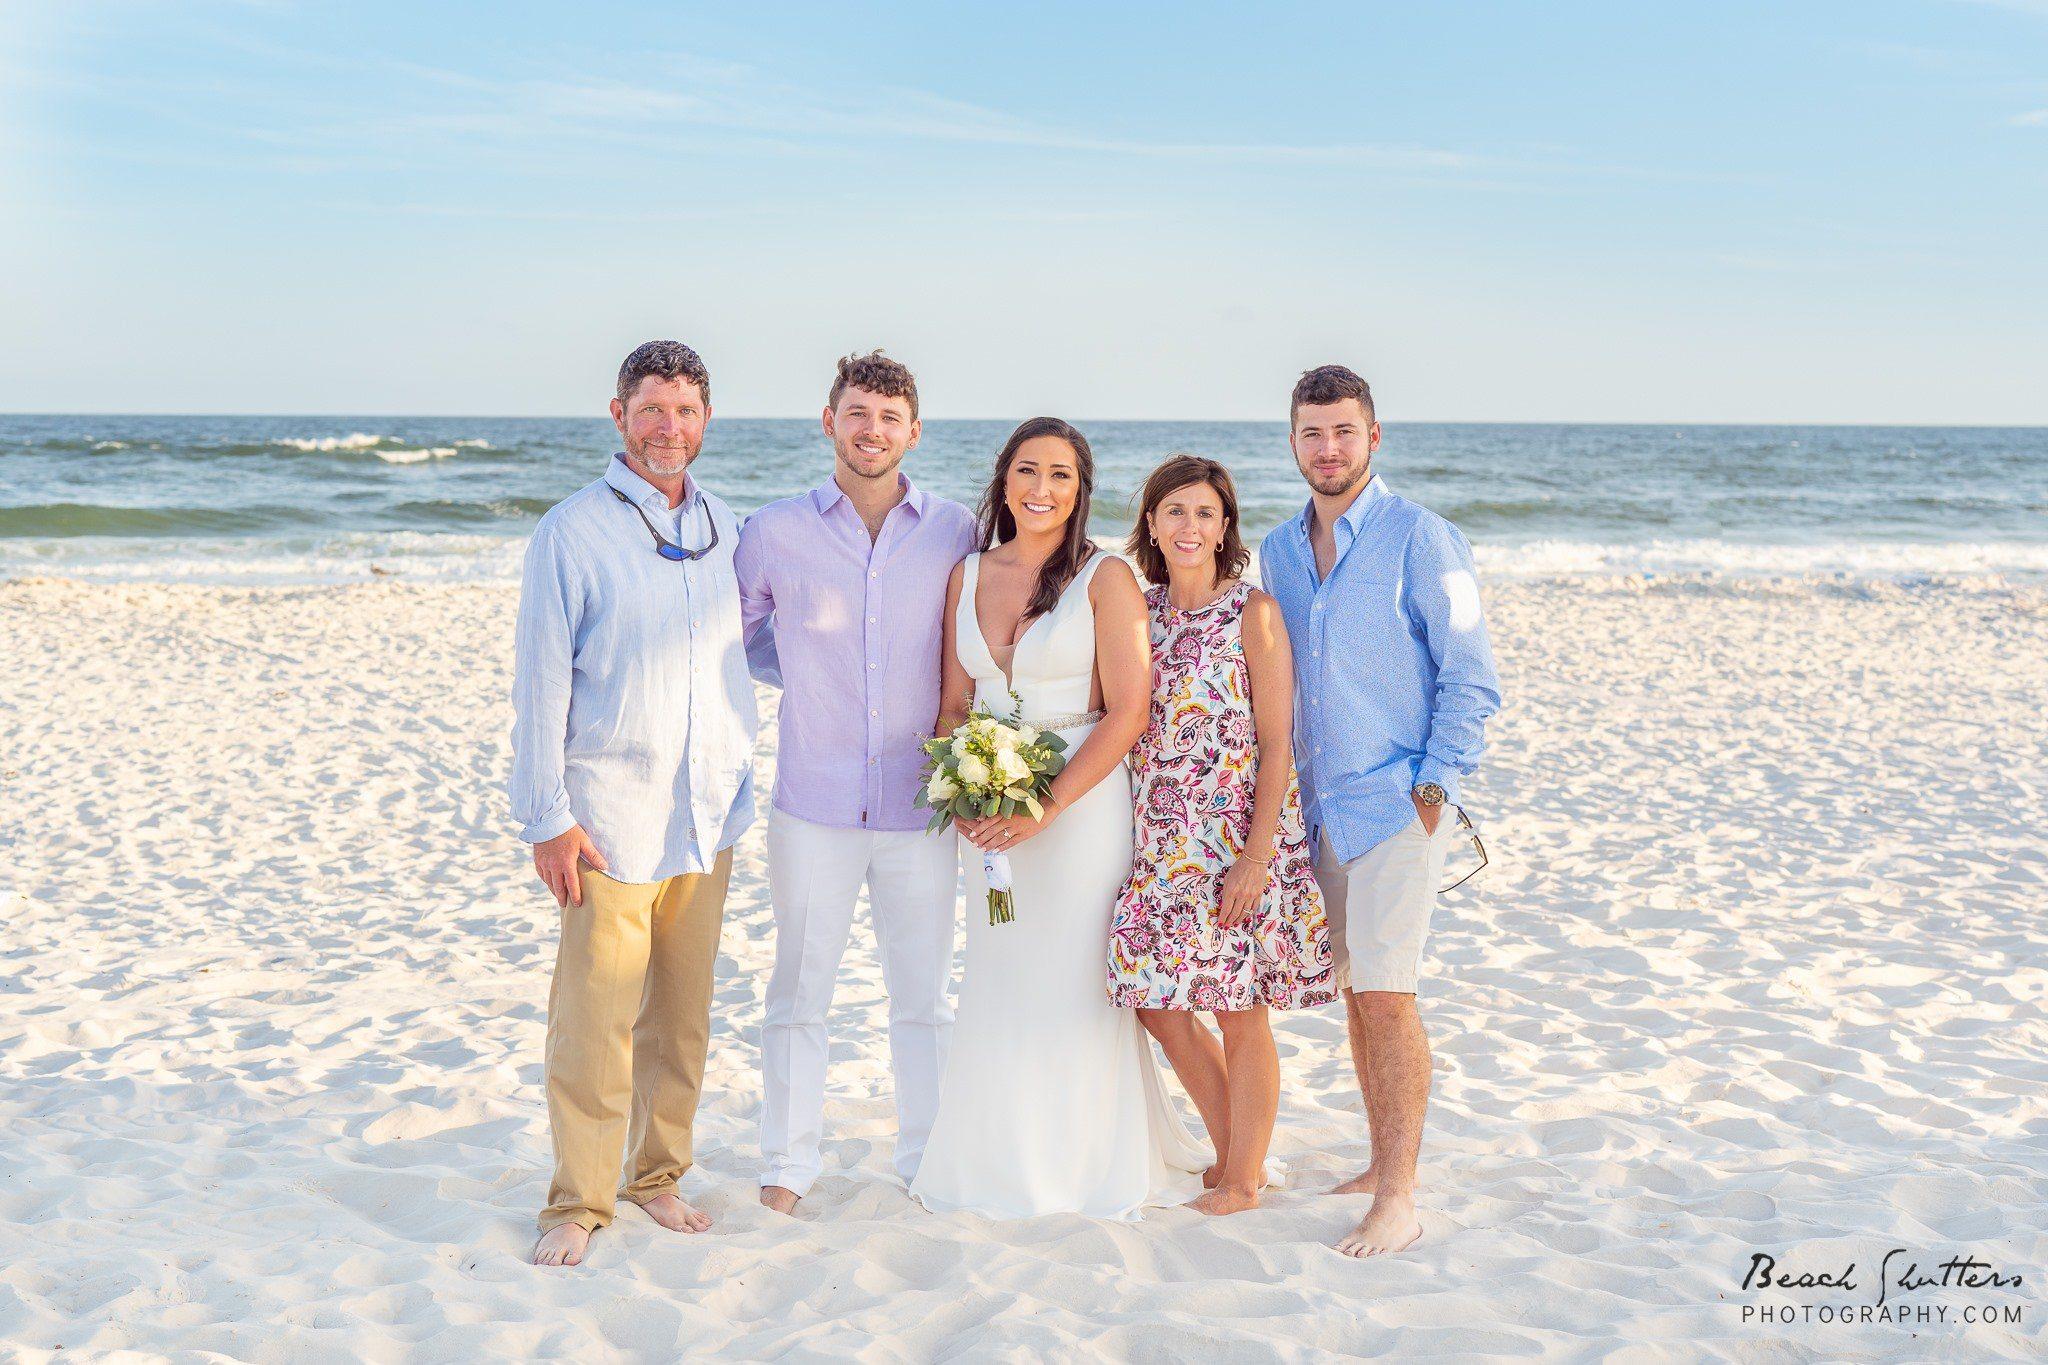 beach portraits wedding